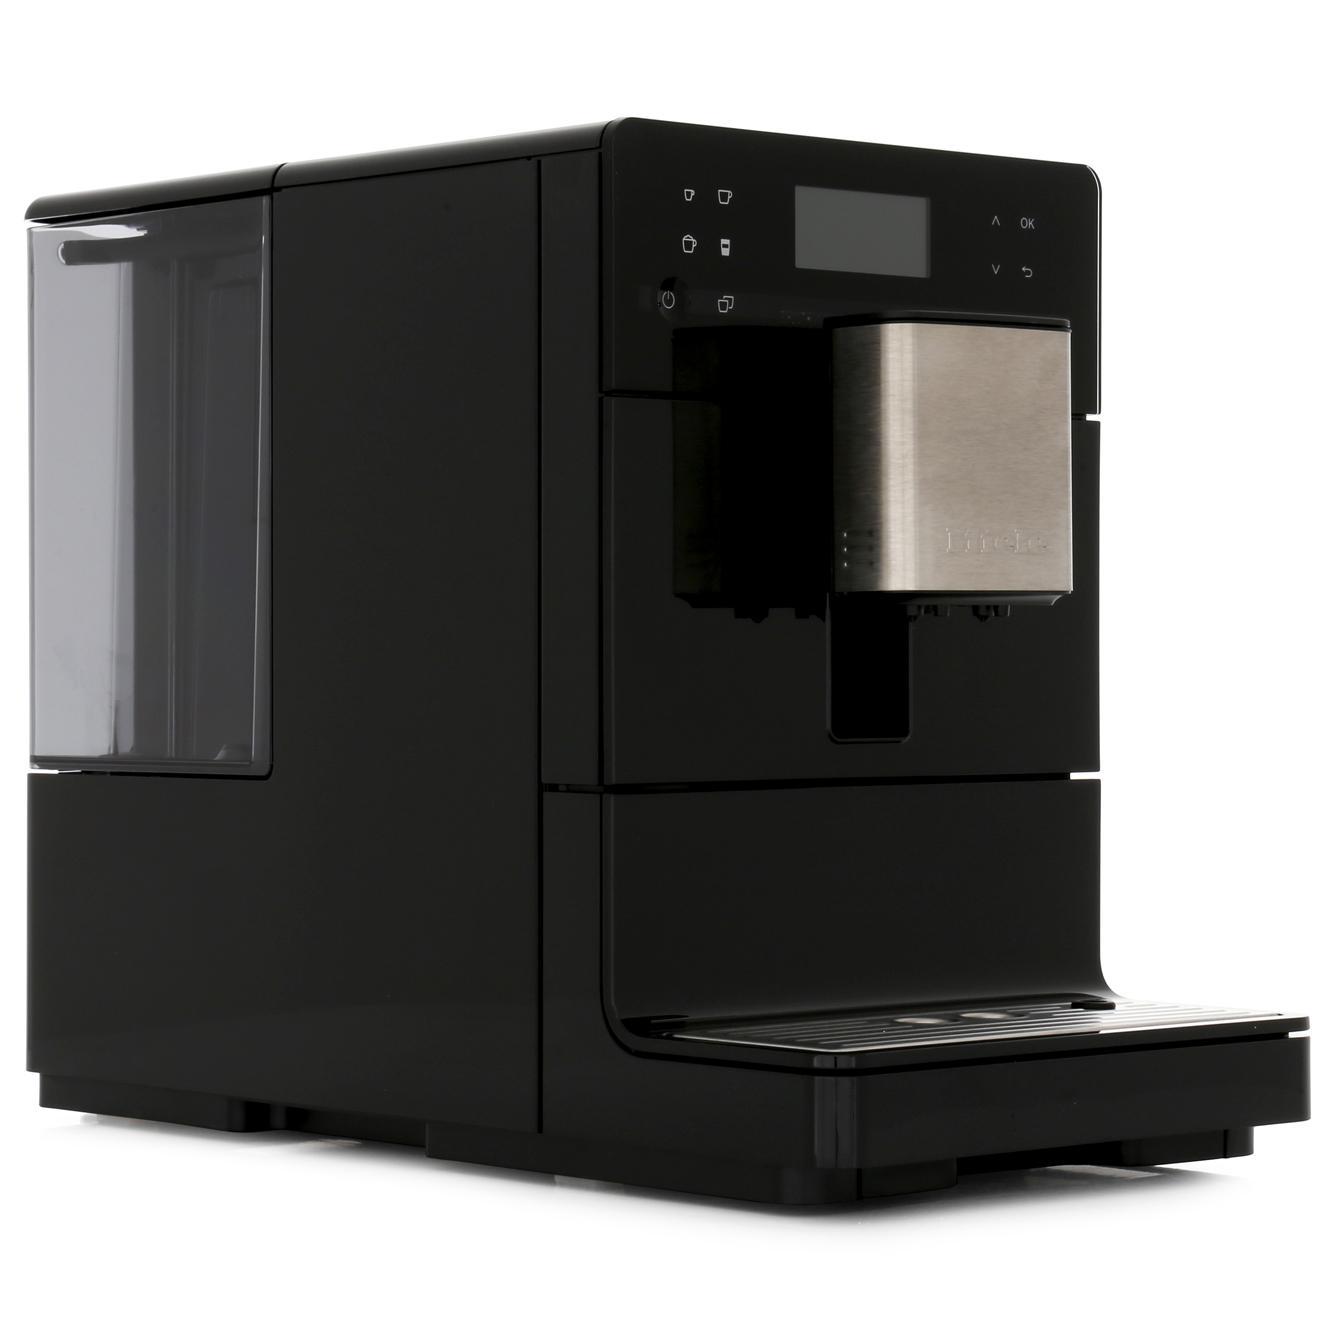 Miele CM5300 Black Coffee Maker